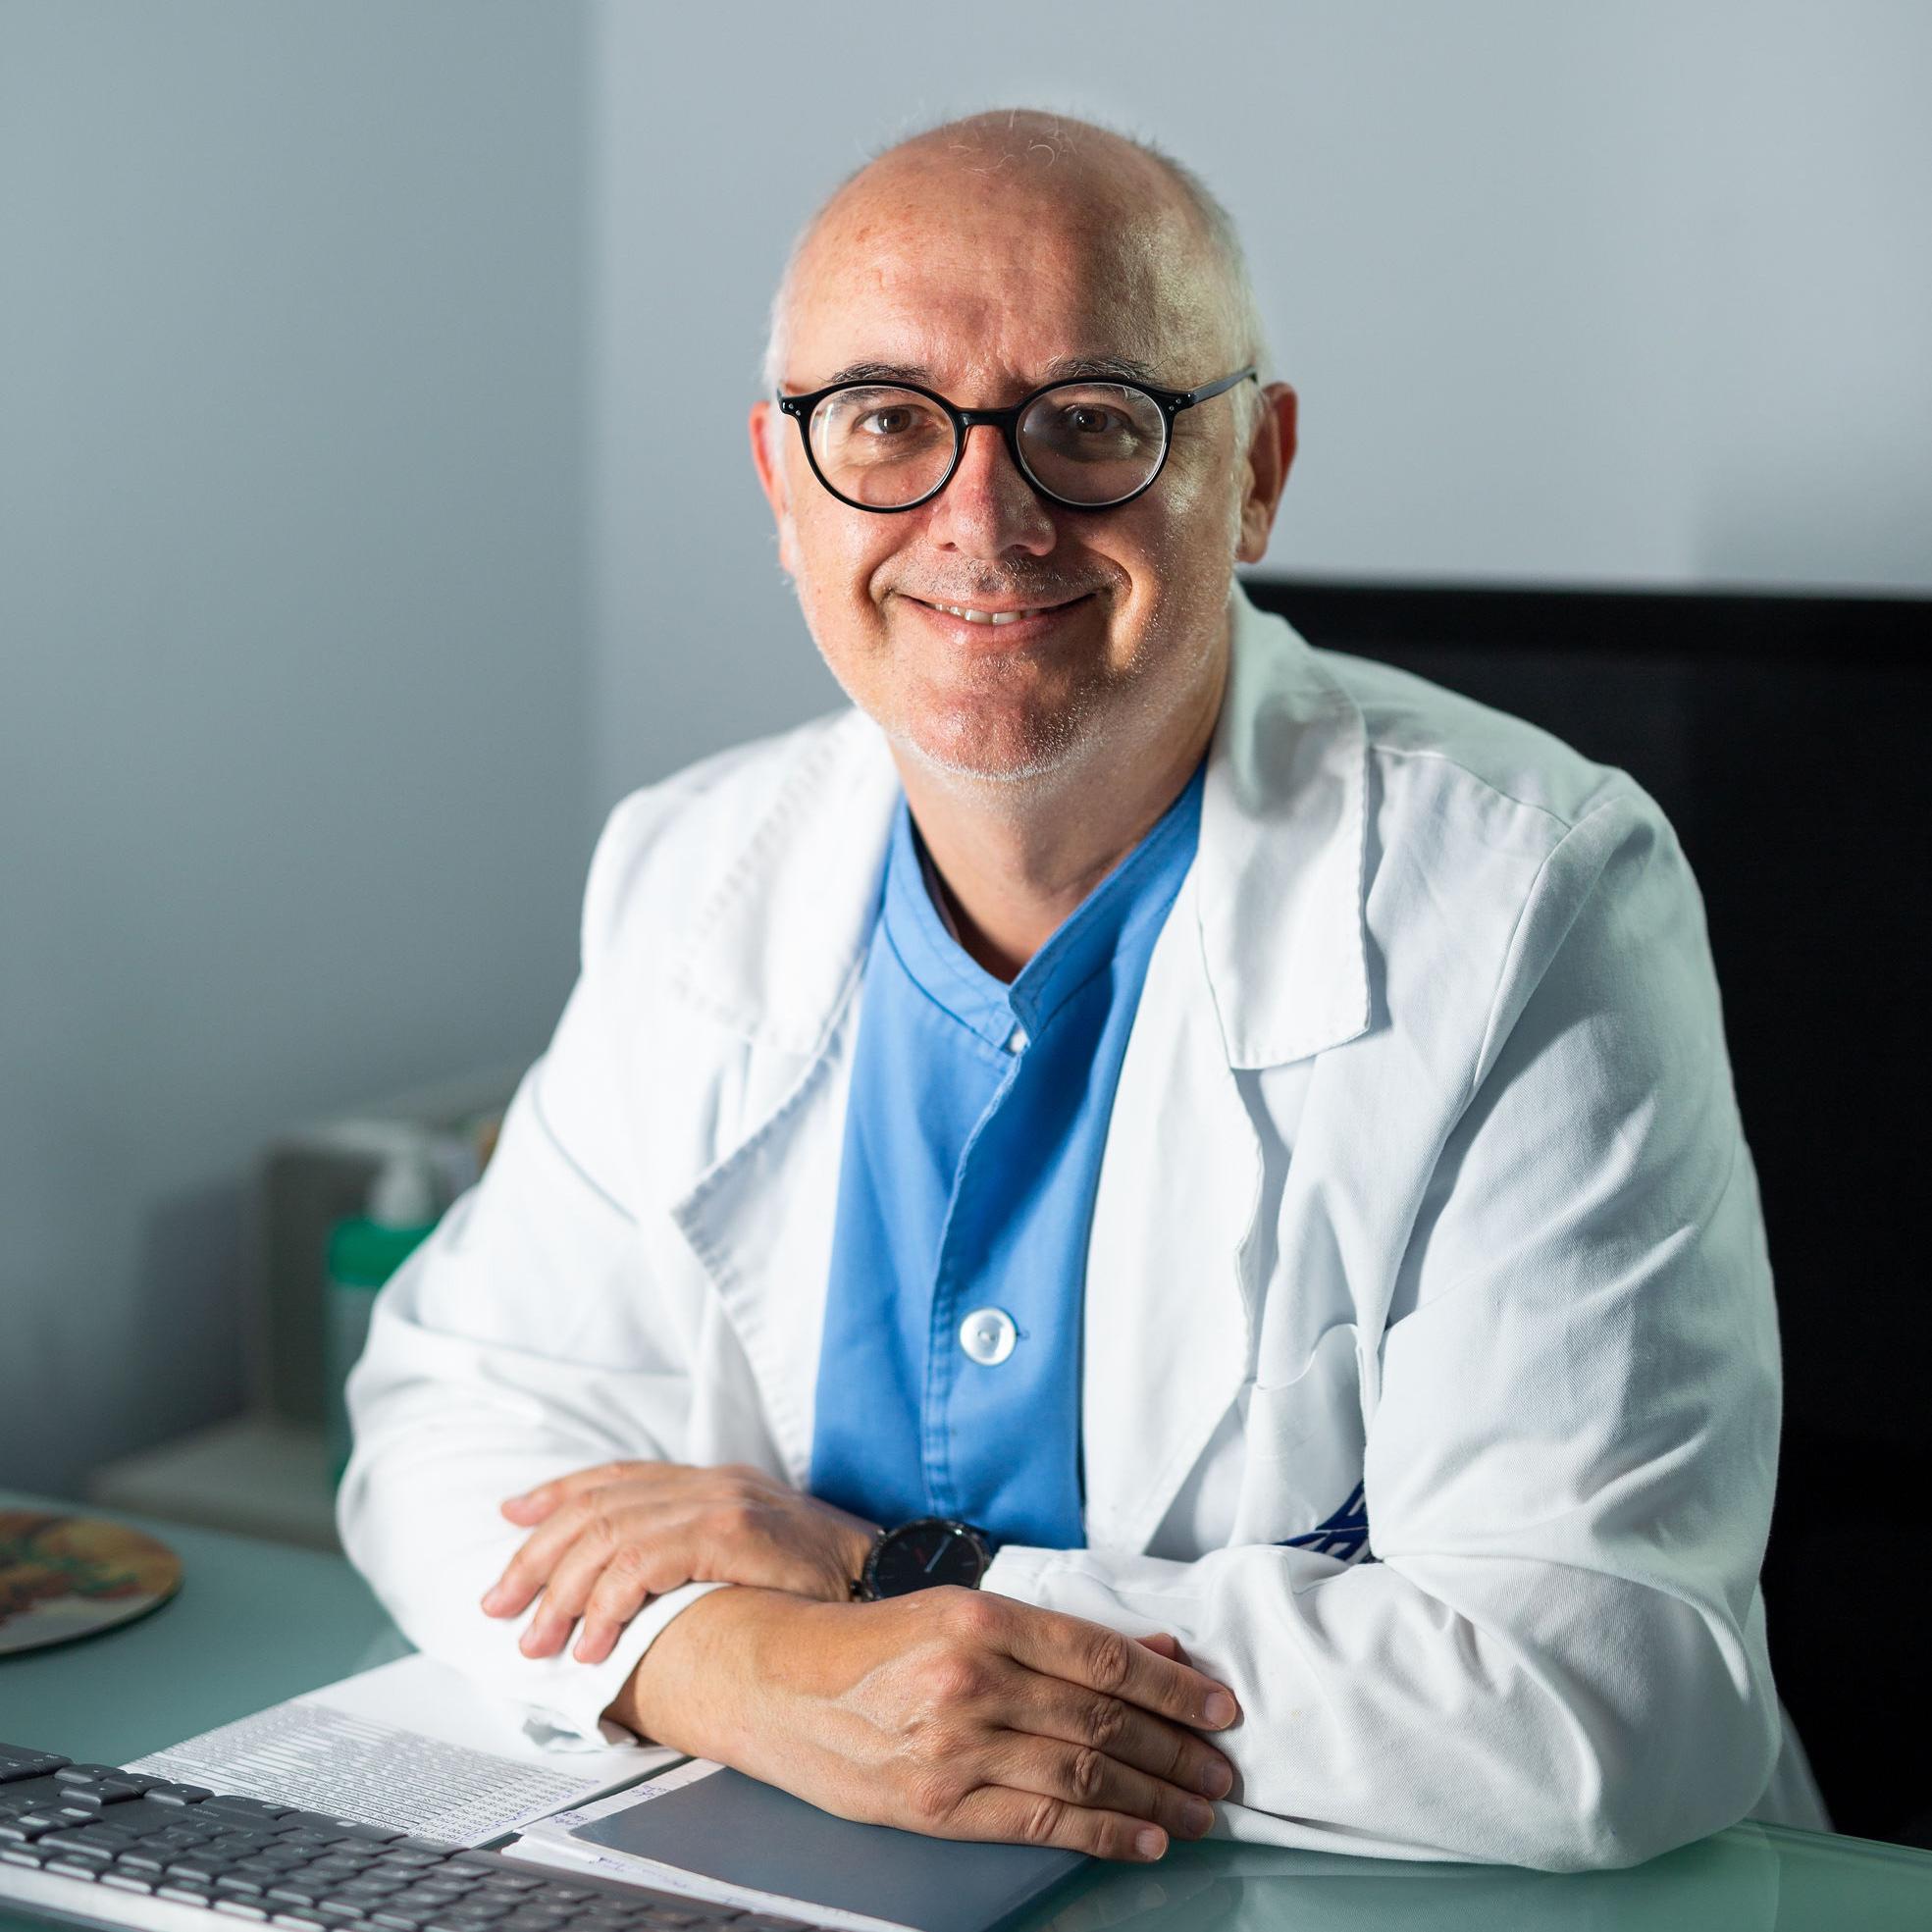 Dr. Rodero